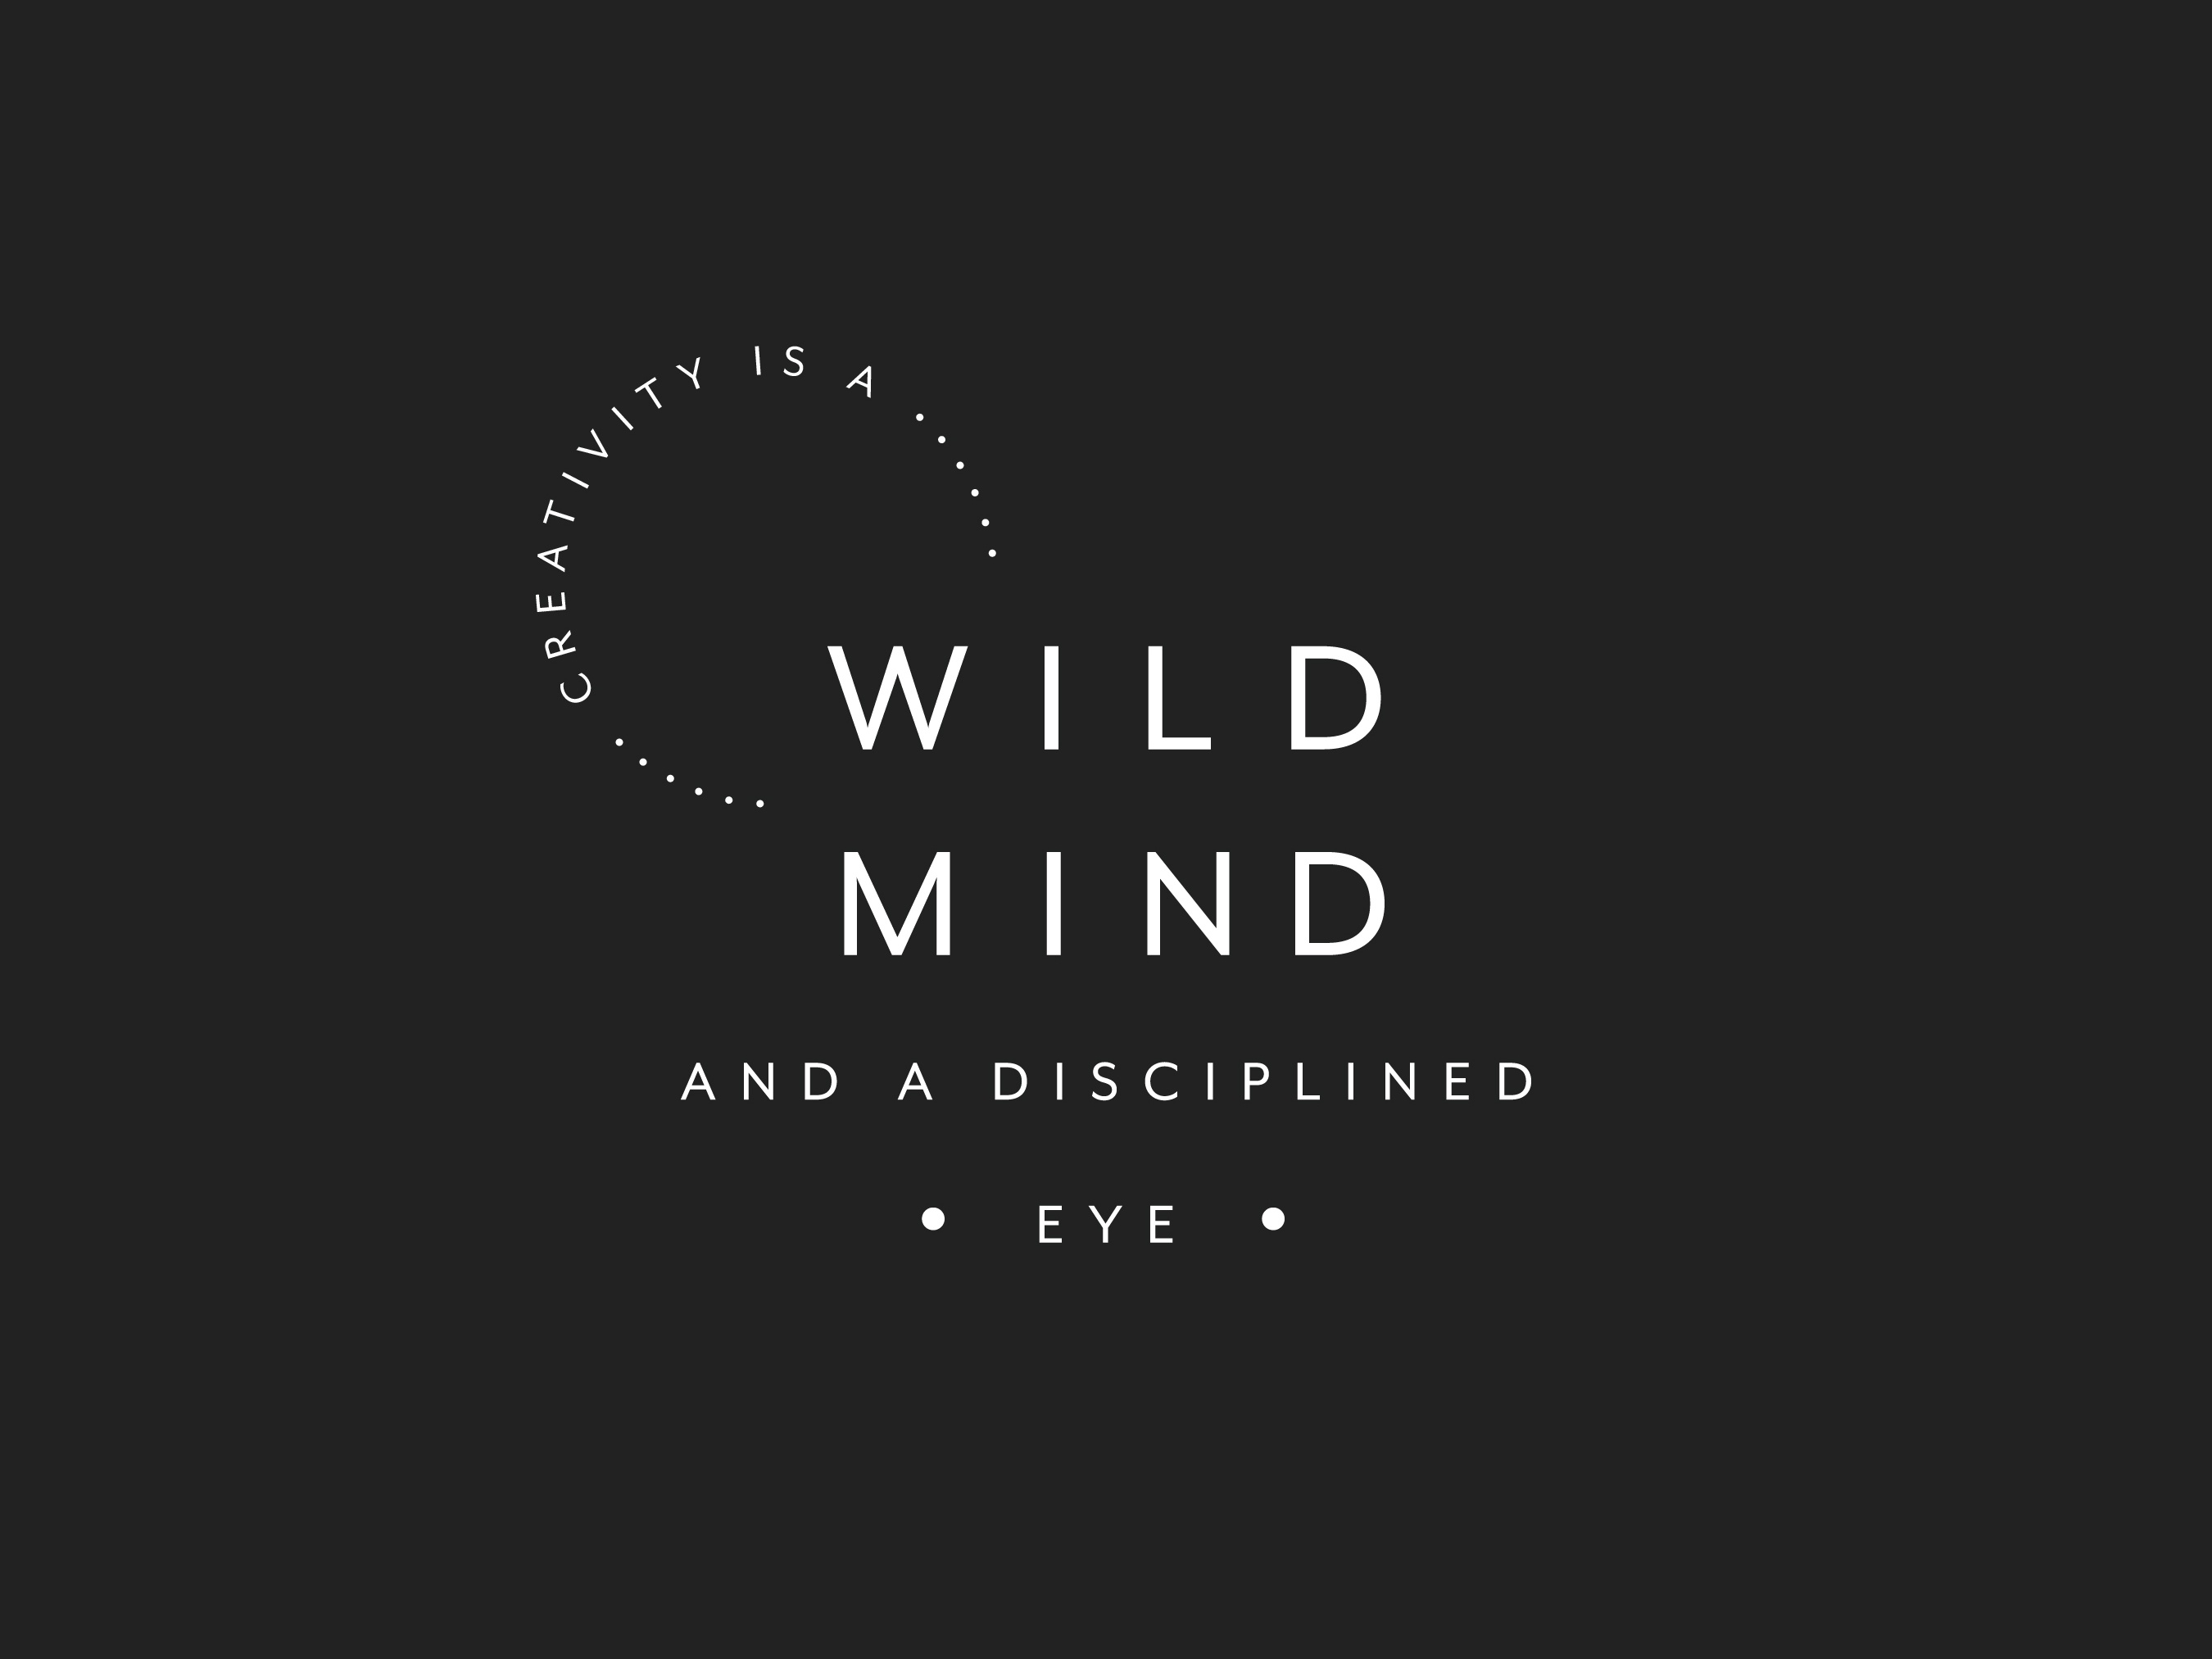 Wildmind2 01